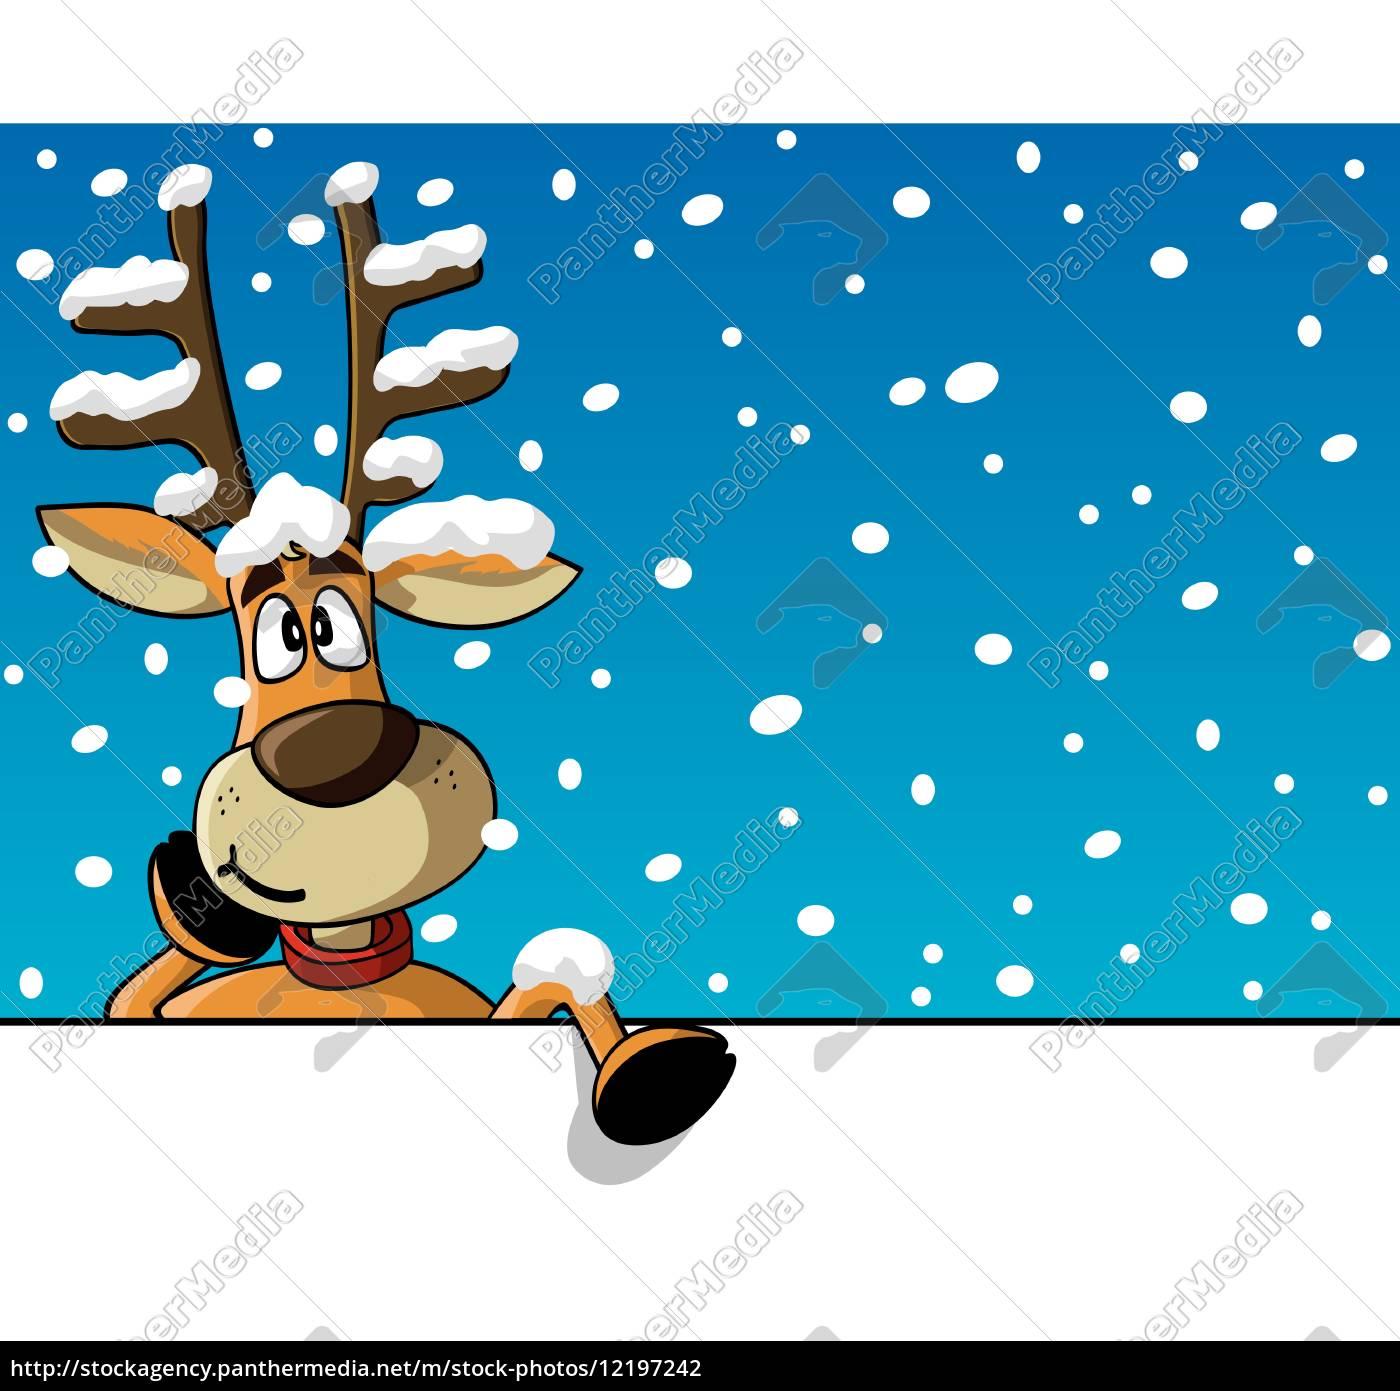 funny, reindeer - 12197242